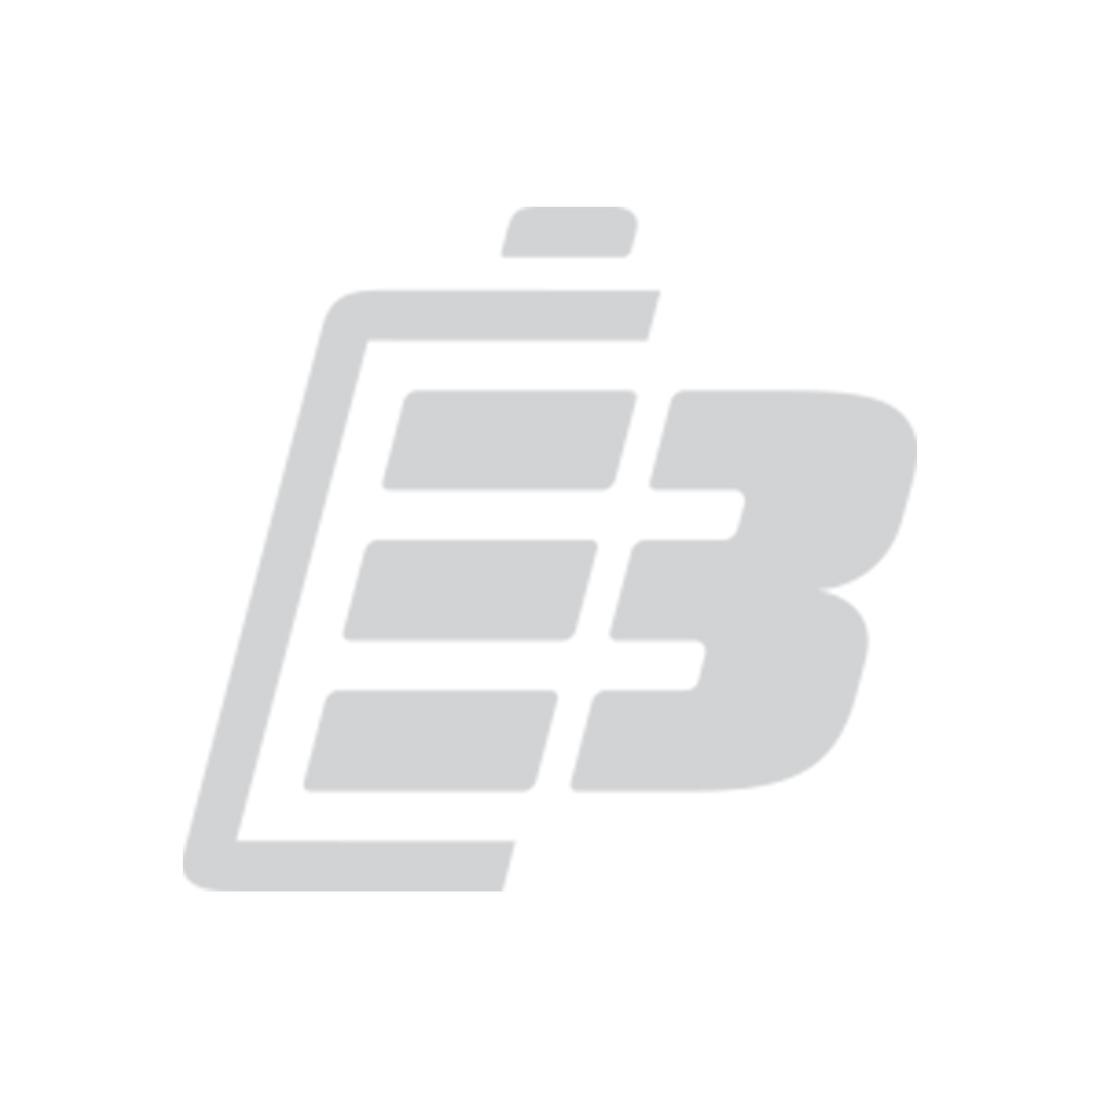 Camcorder battery Aiptek Mini Pocket DV 8900_1